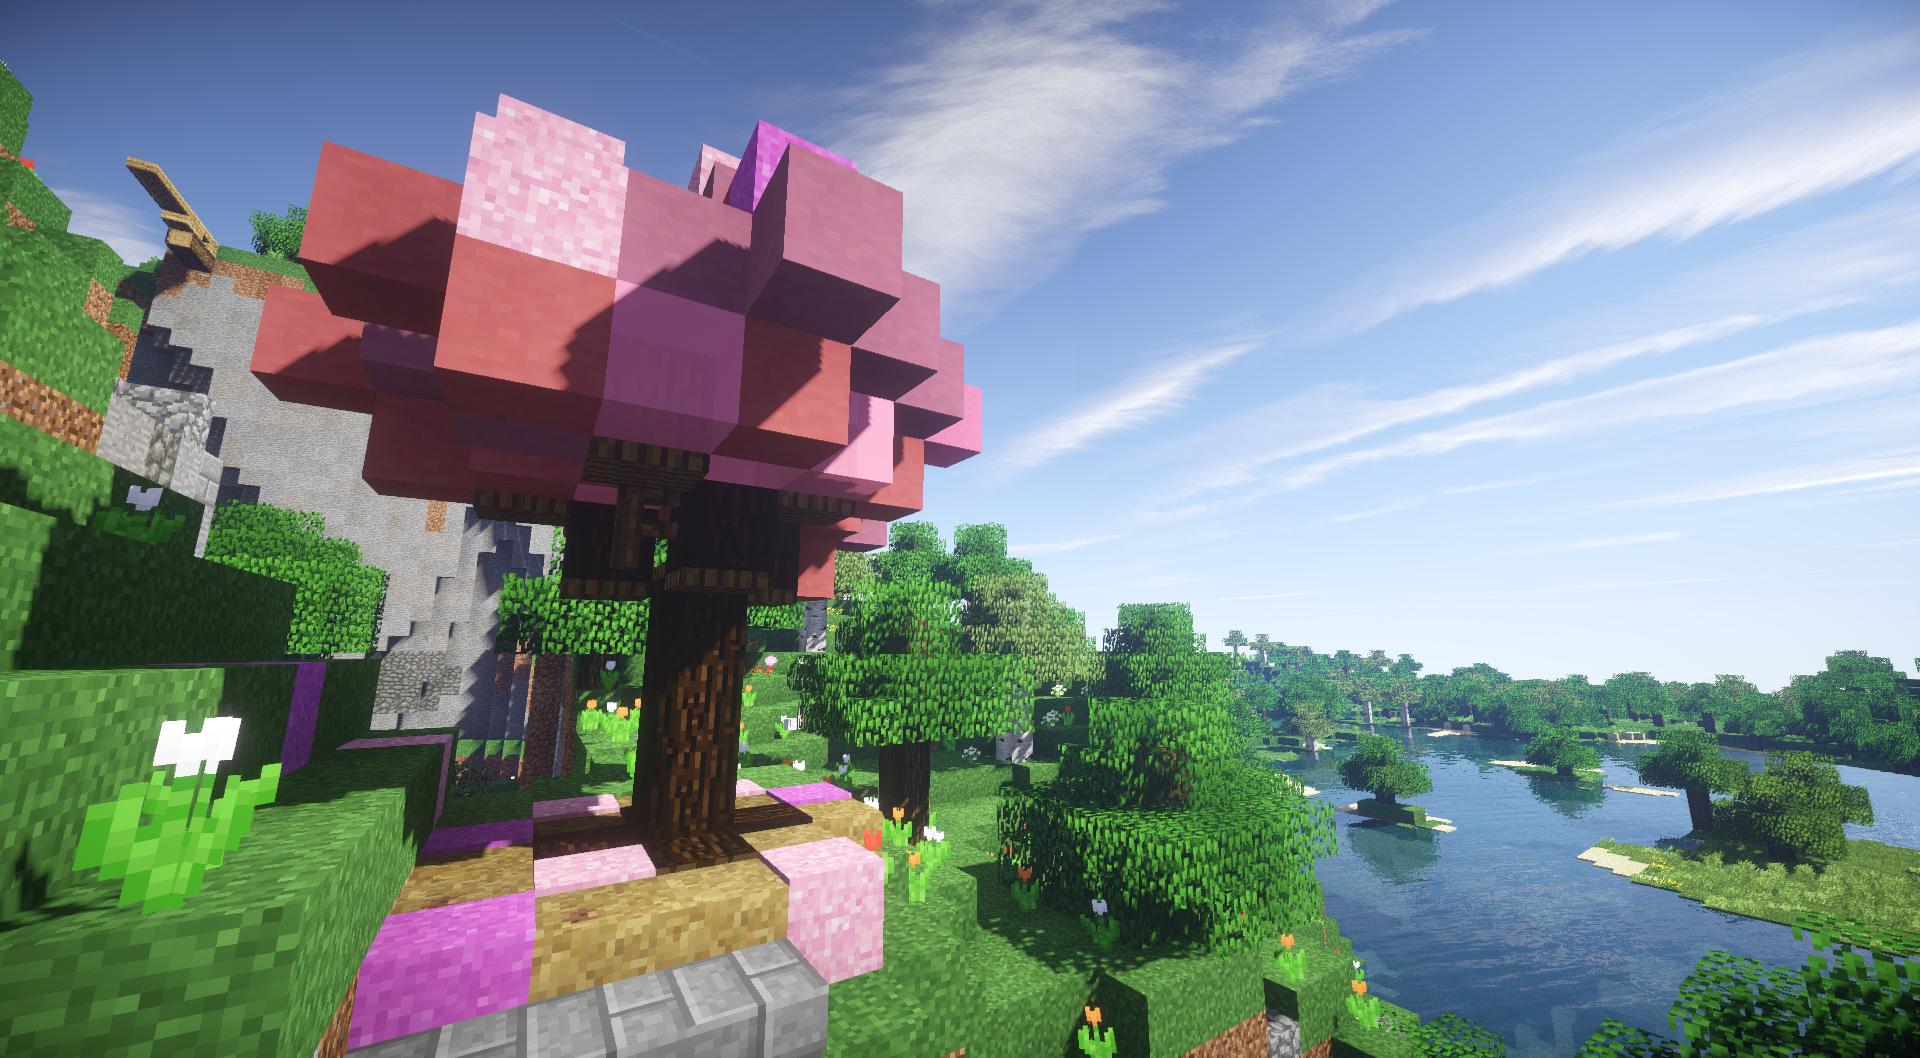 Cherry tree, view towards trampoline